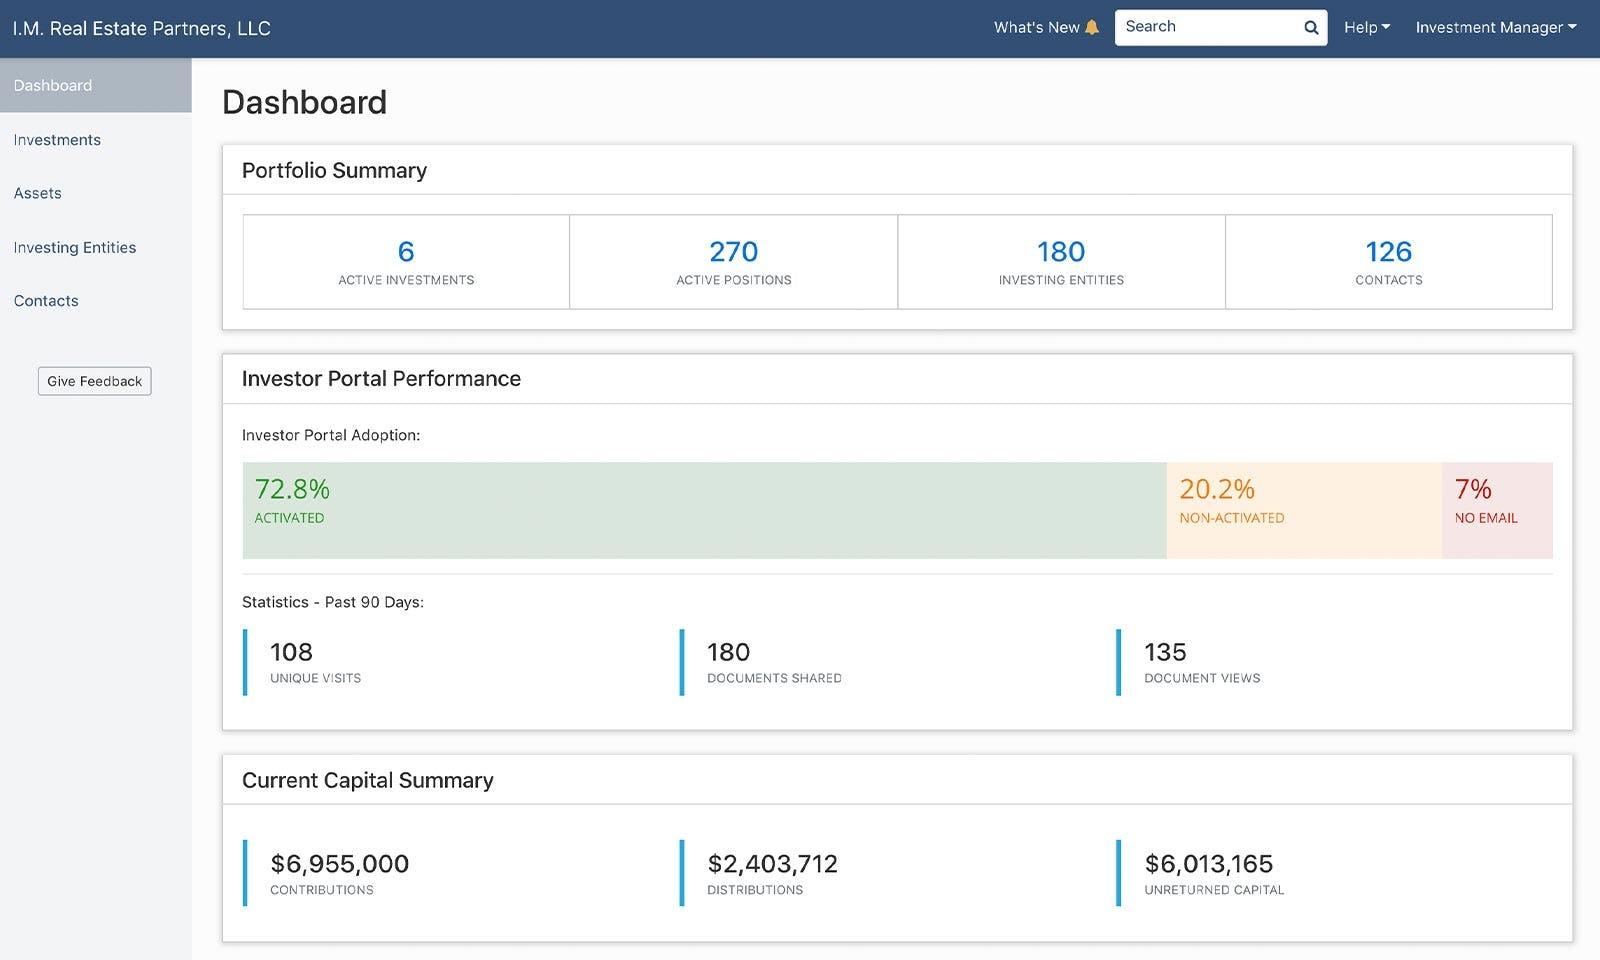 AppFolio Investment Management Software - AppFolio Investment Management dashboard